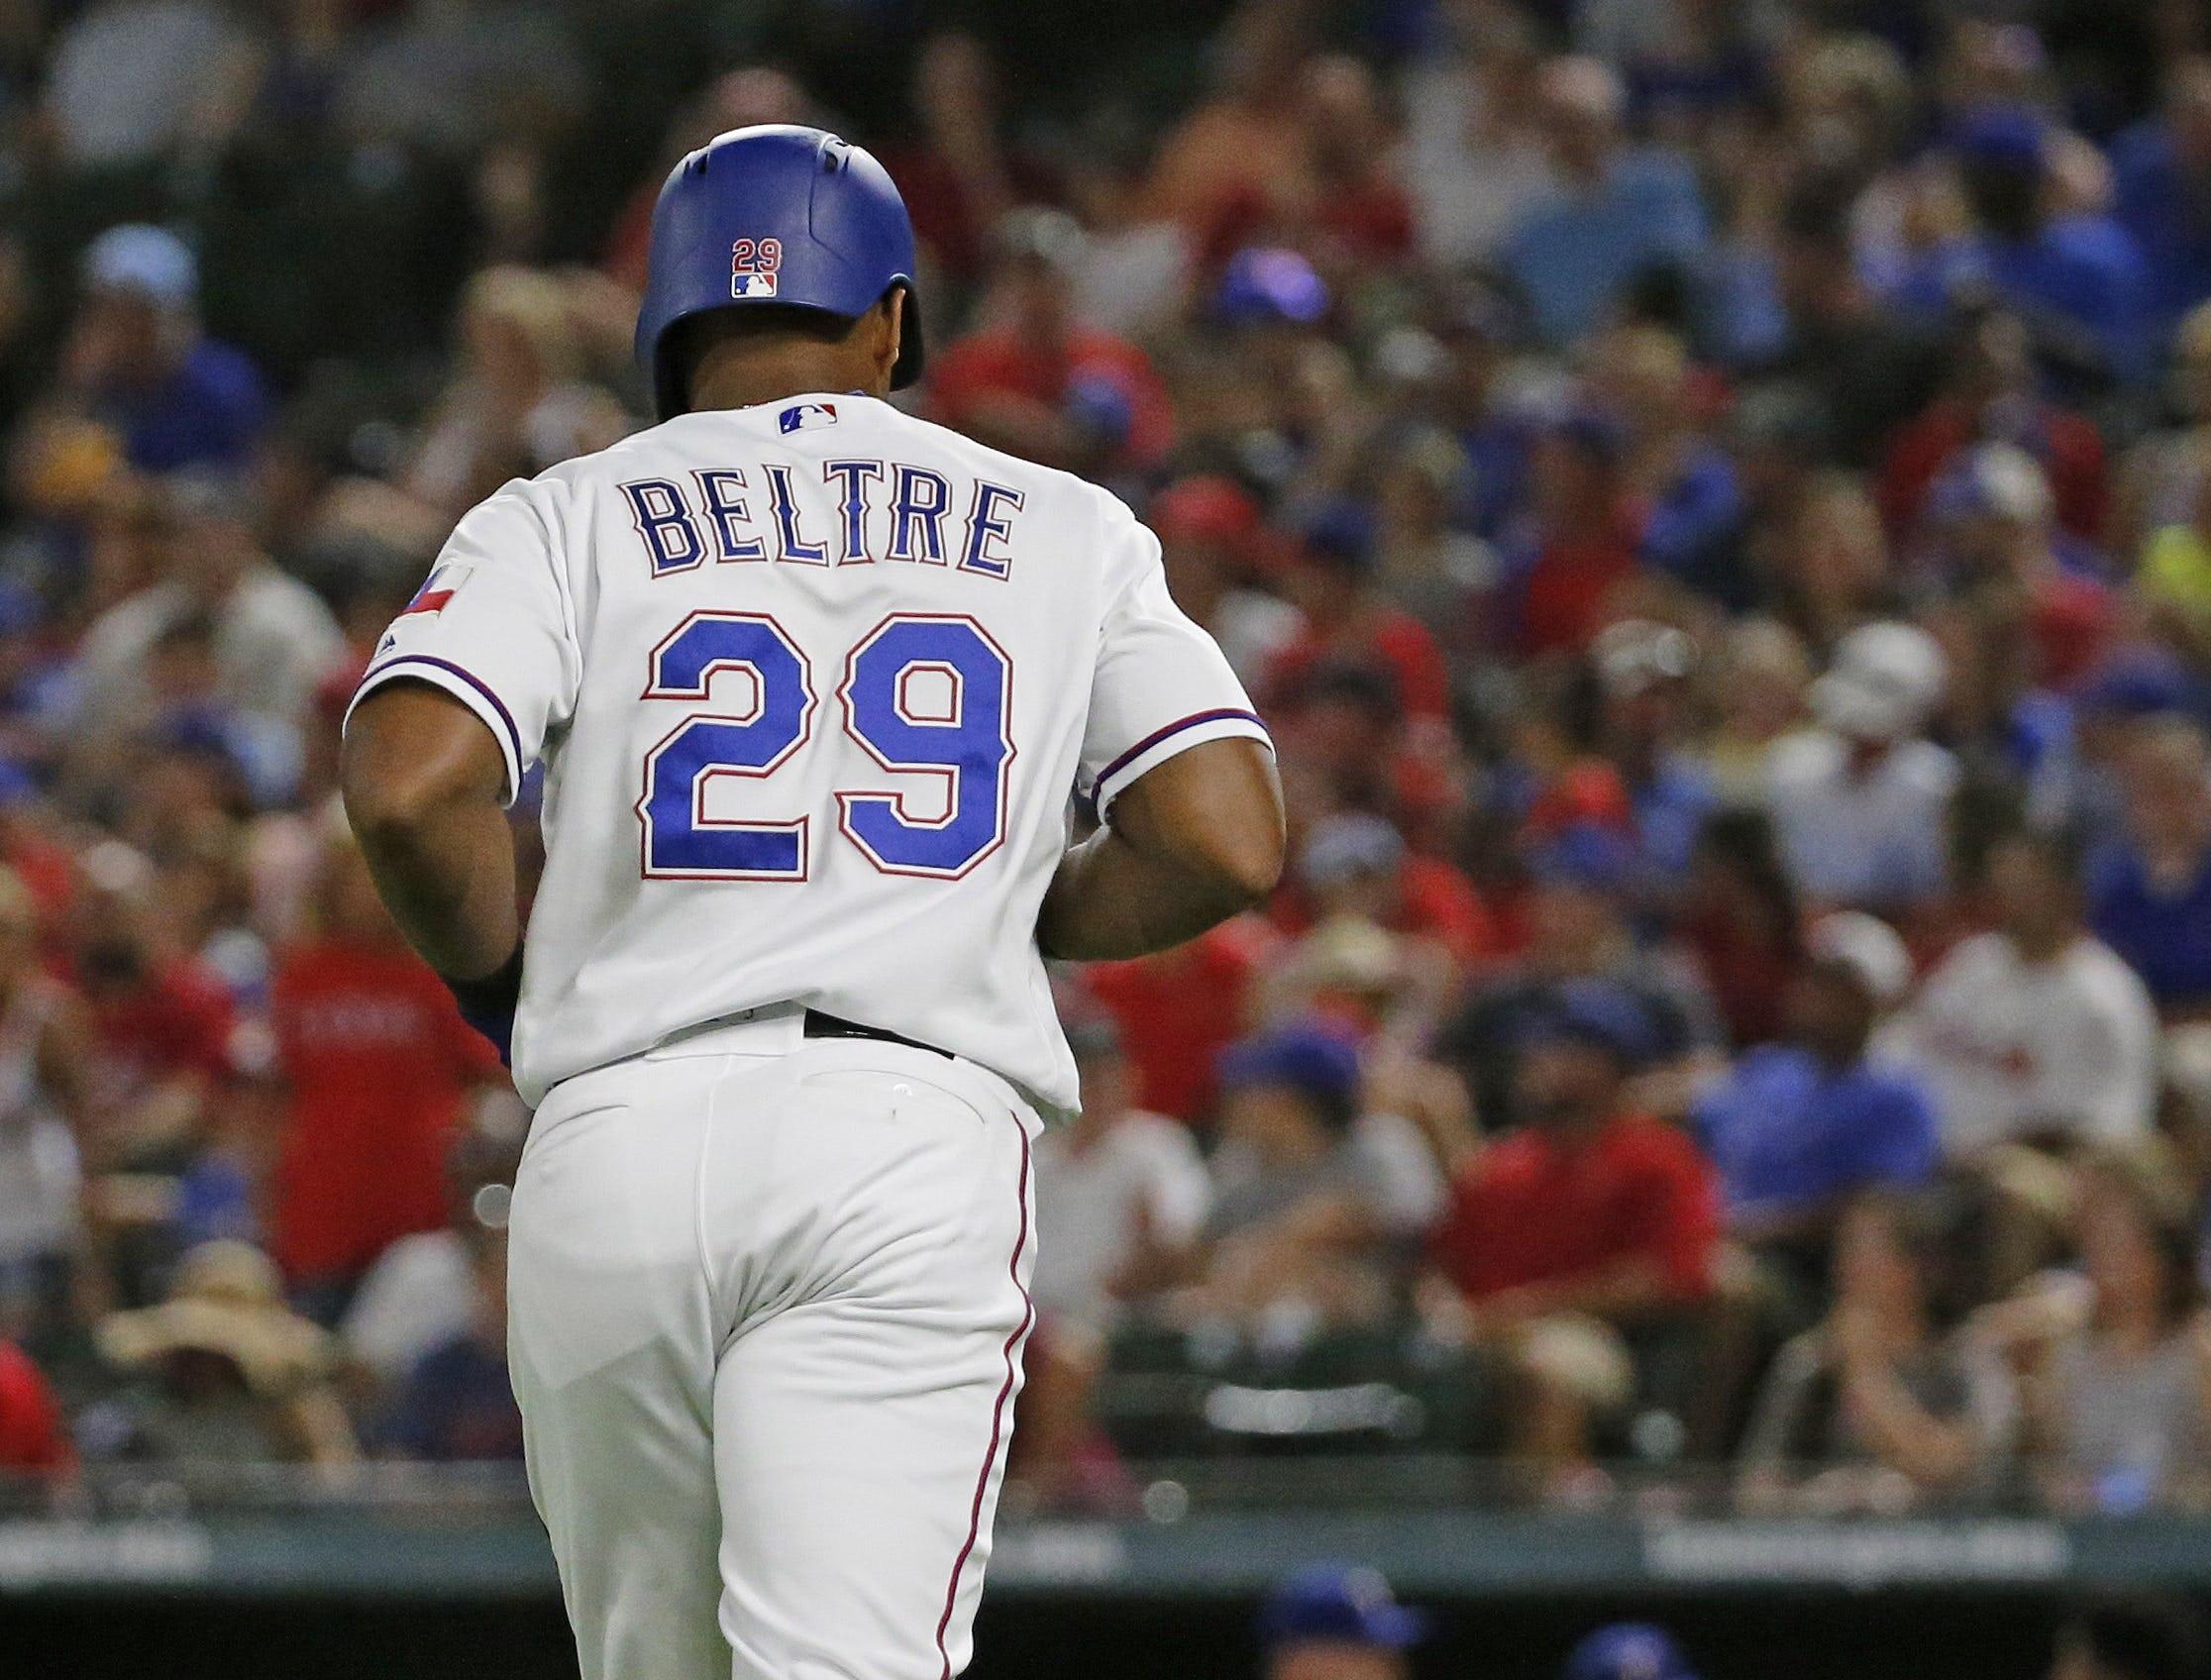 Rangers announce Adrian Beltre's No. 29 will be retired June 8 vs. Oakland